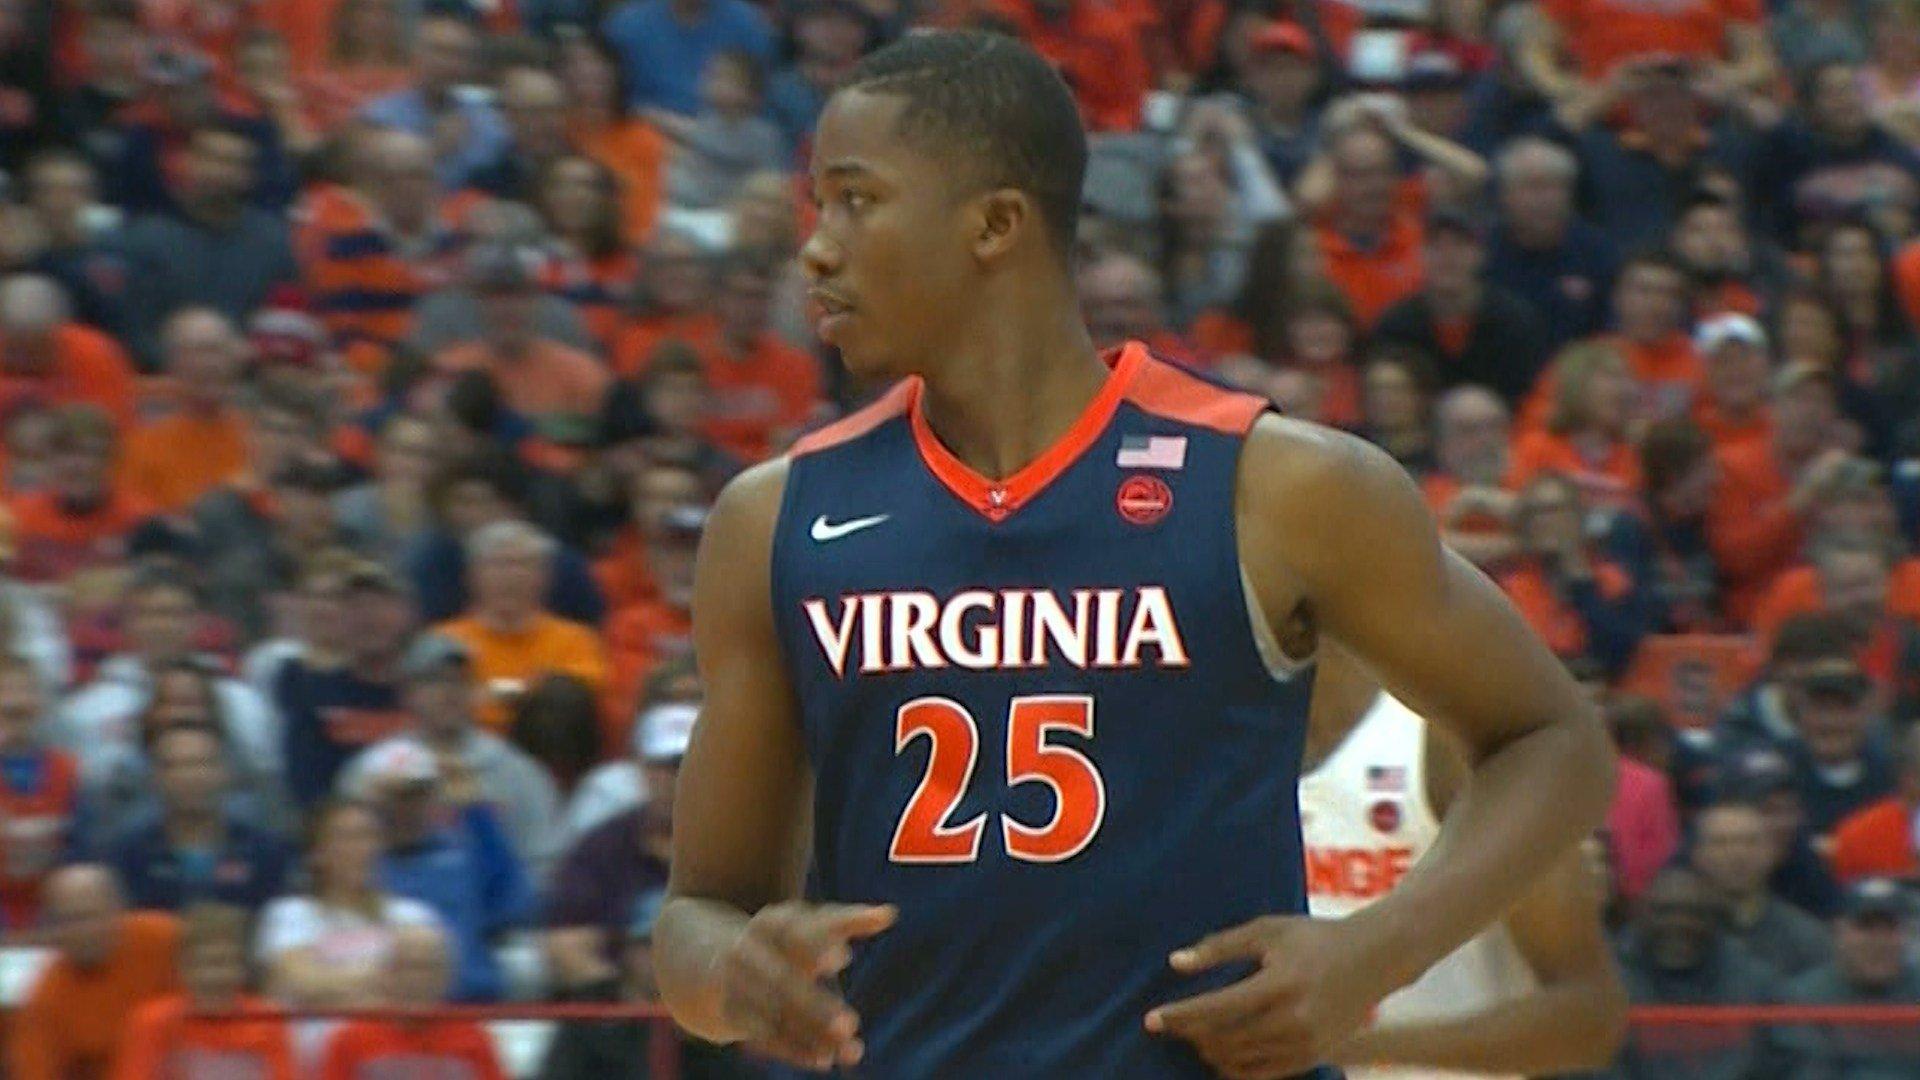 Virginia's Mamadi Diakite scored 12 points